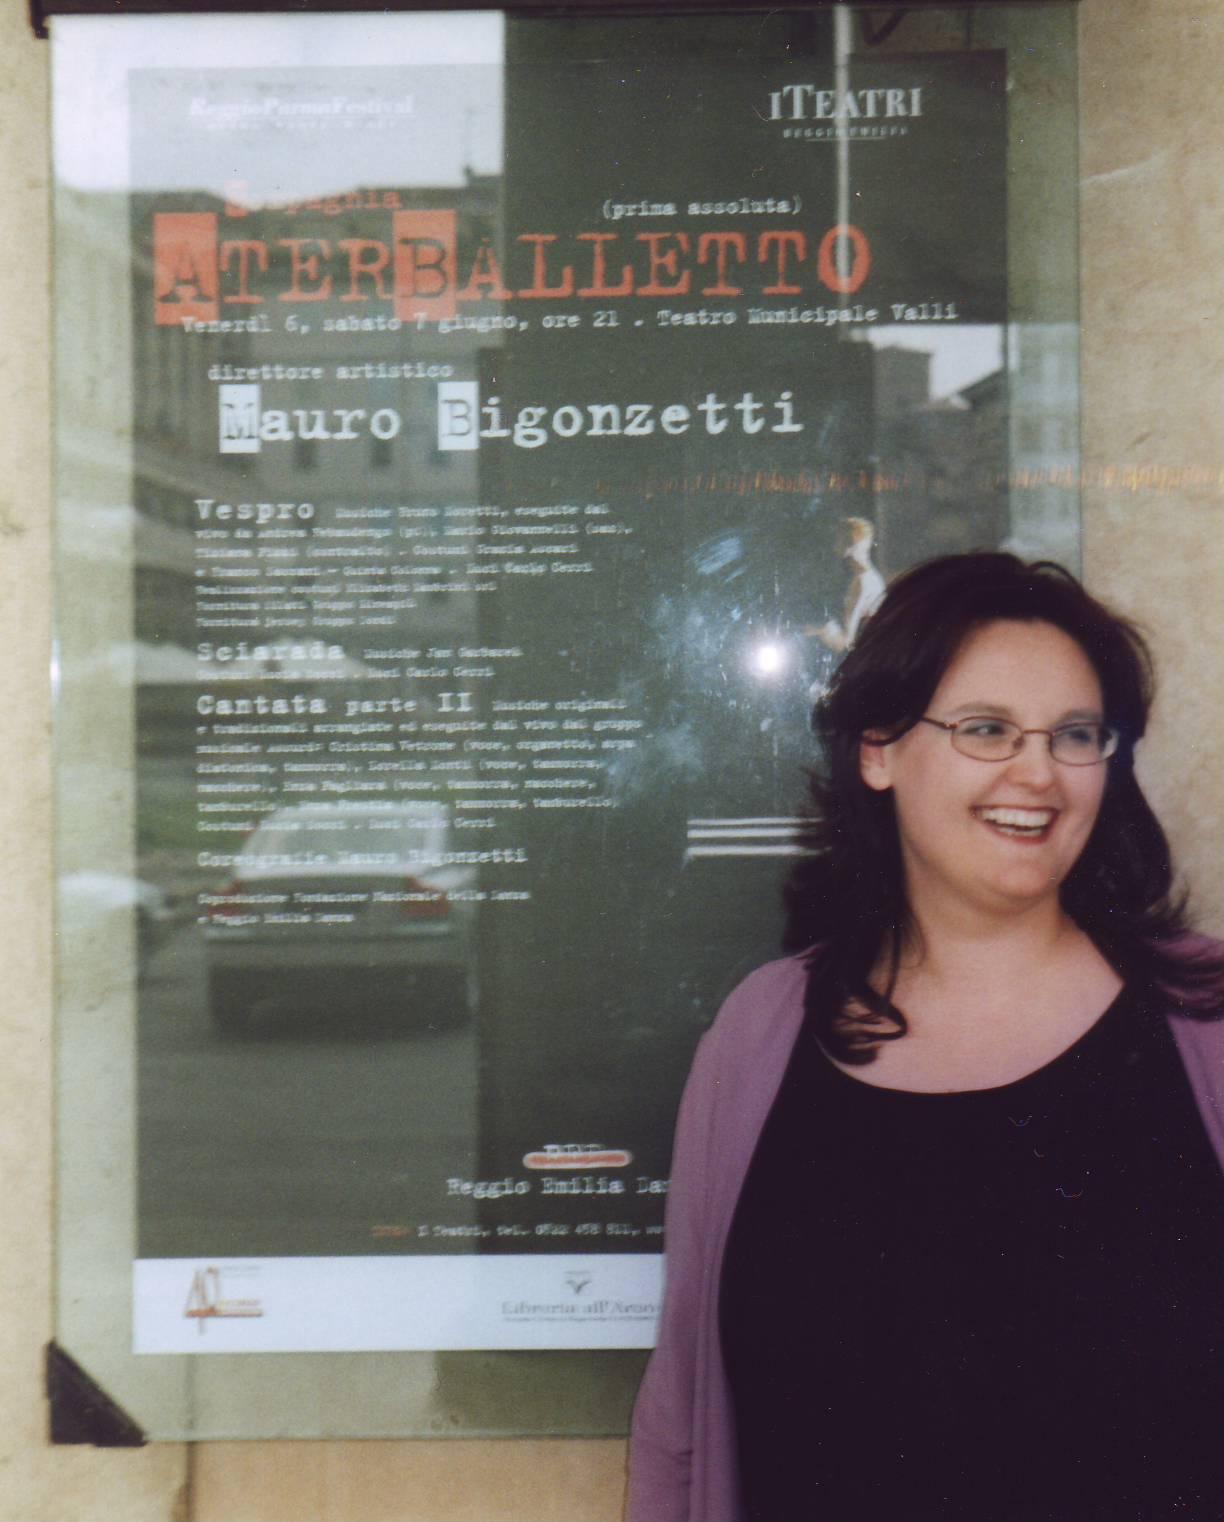 Vespro 2004-Teatro Valli